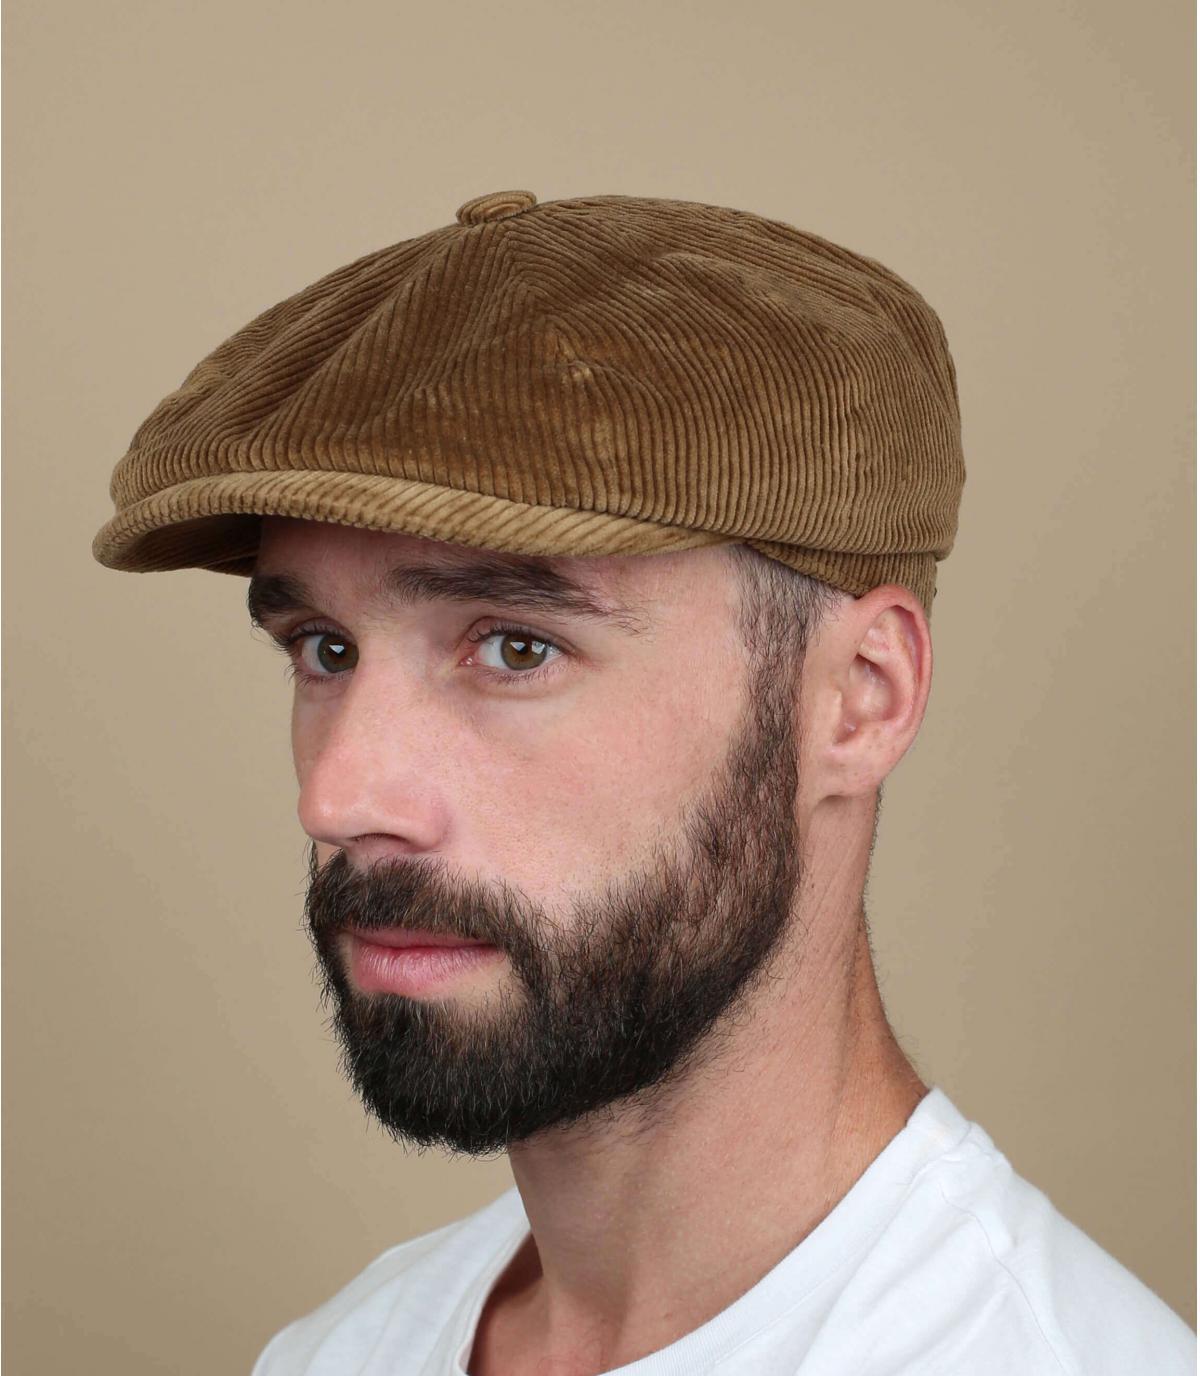 gorra repartidor pana beis